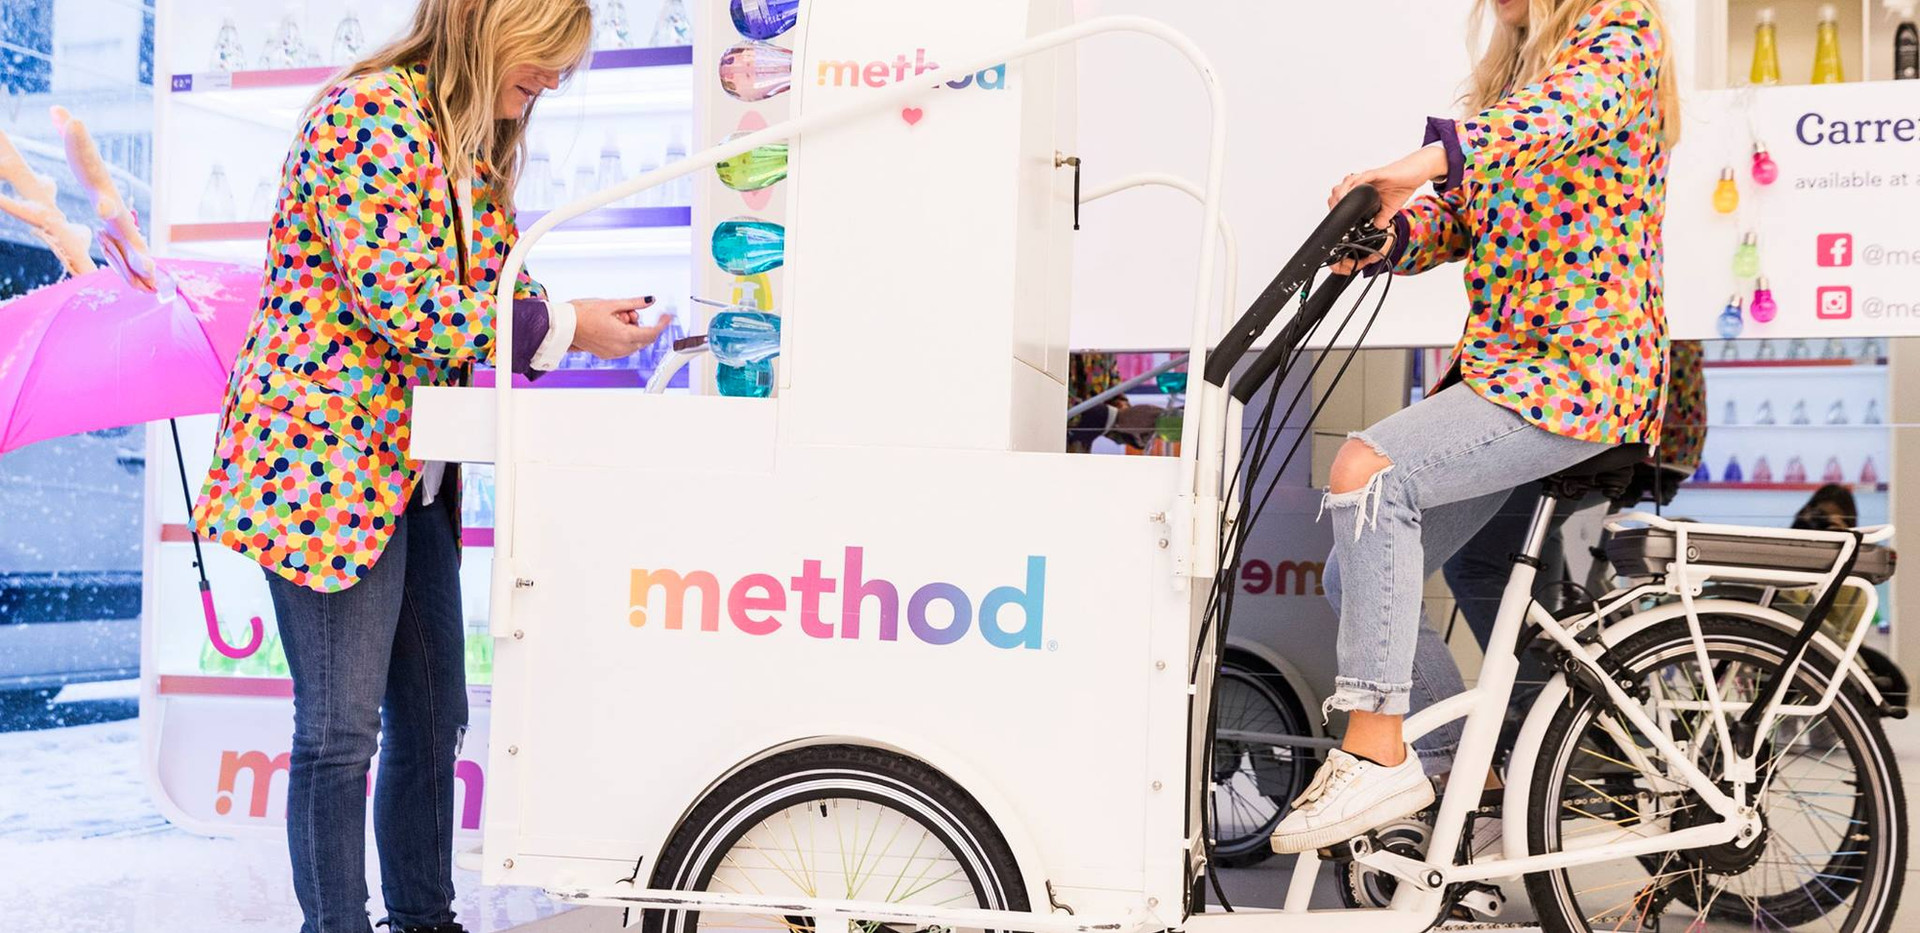 Method pop up store